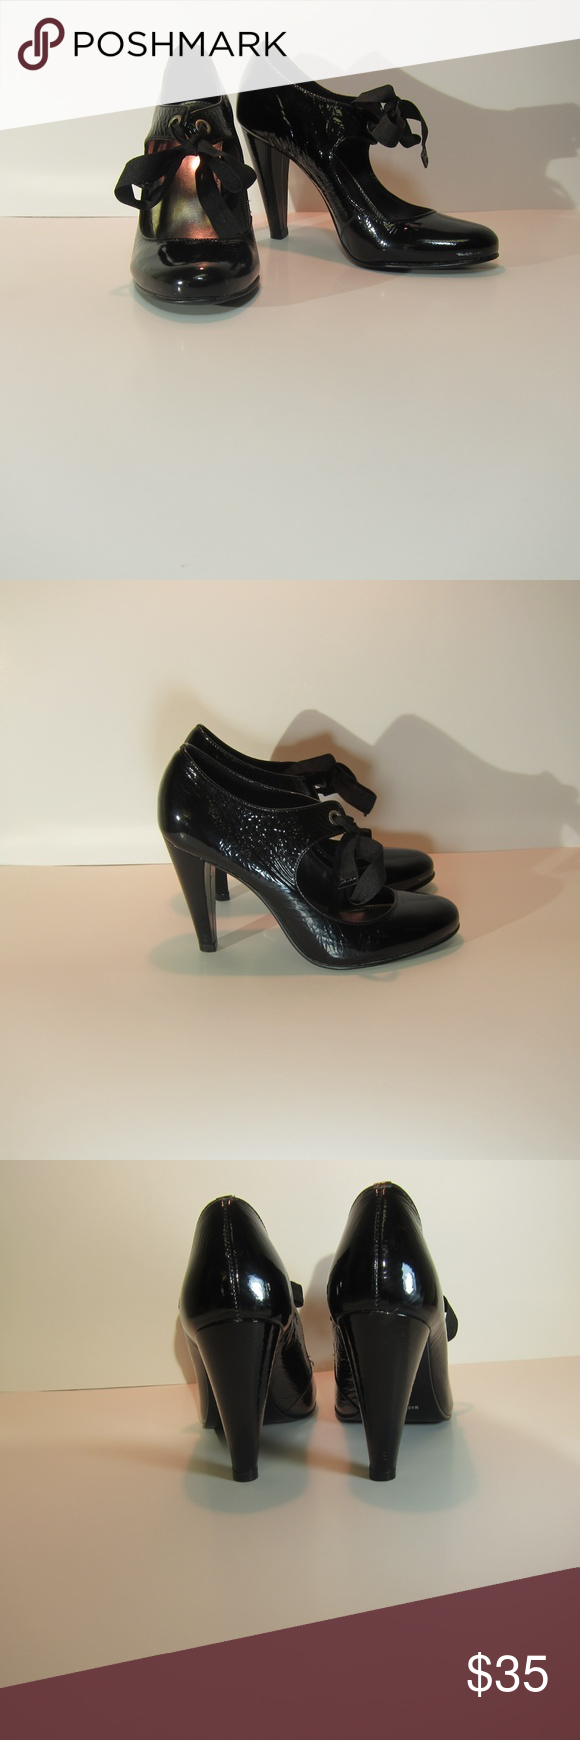 99809faa5cb3 Carvela Black Heels Size 8  Carvela Black Heels❤ Size 38 (8)❤ 4